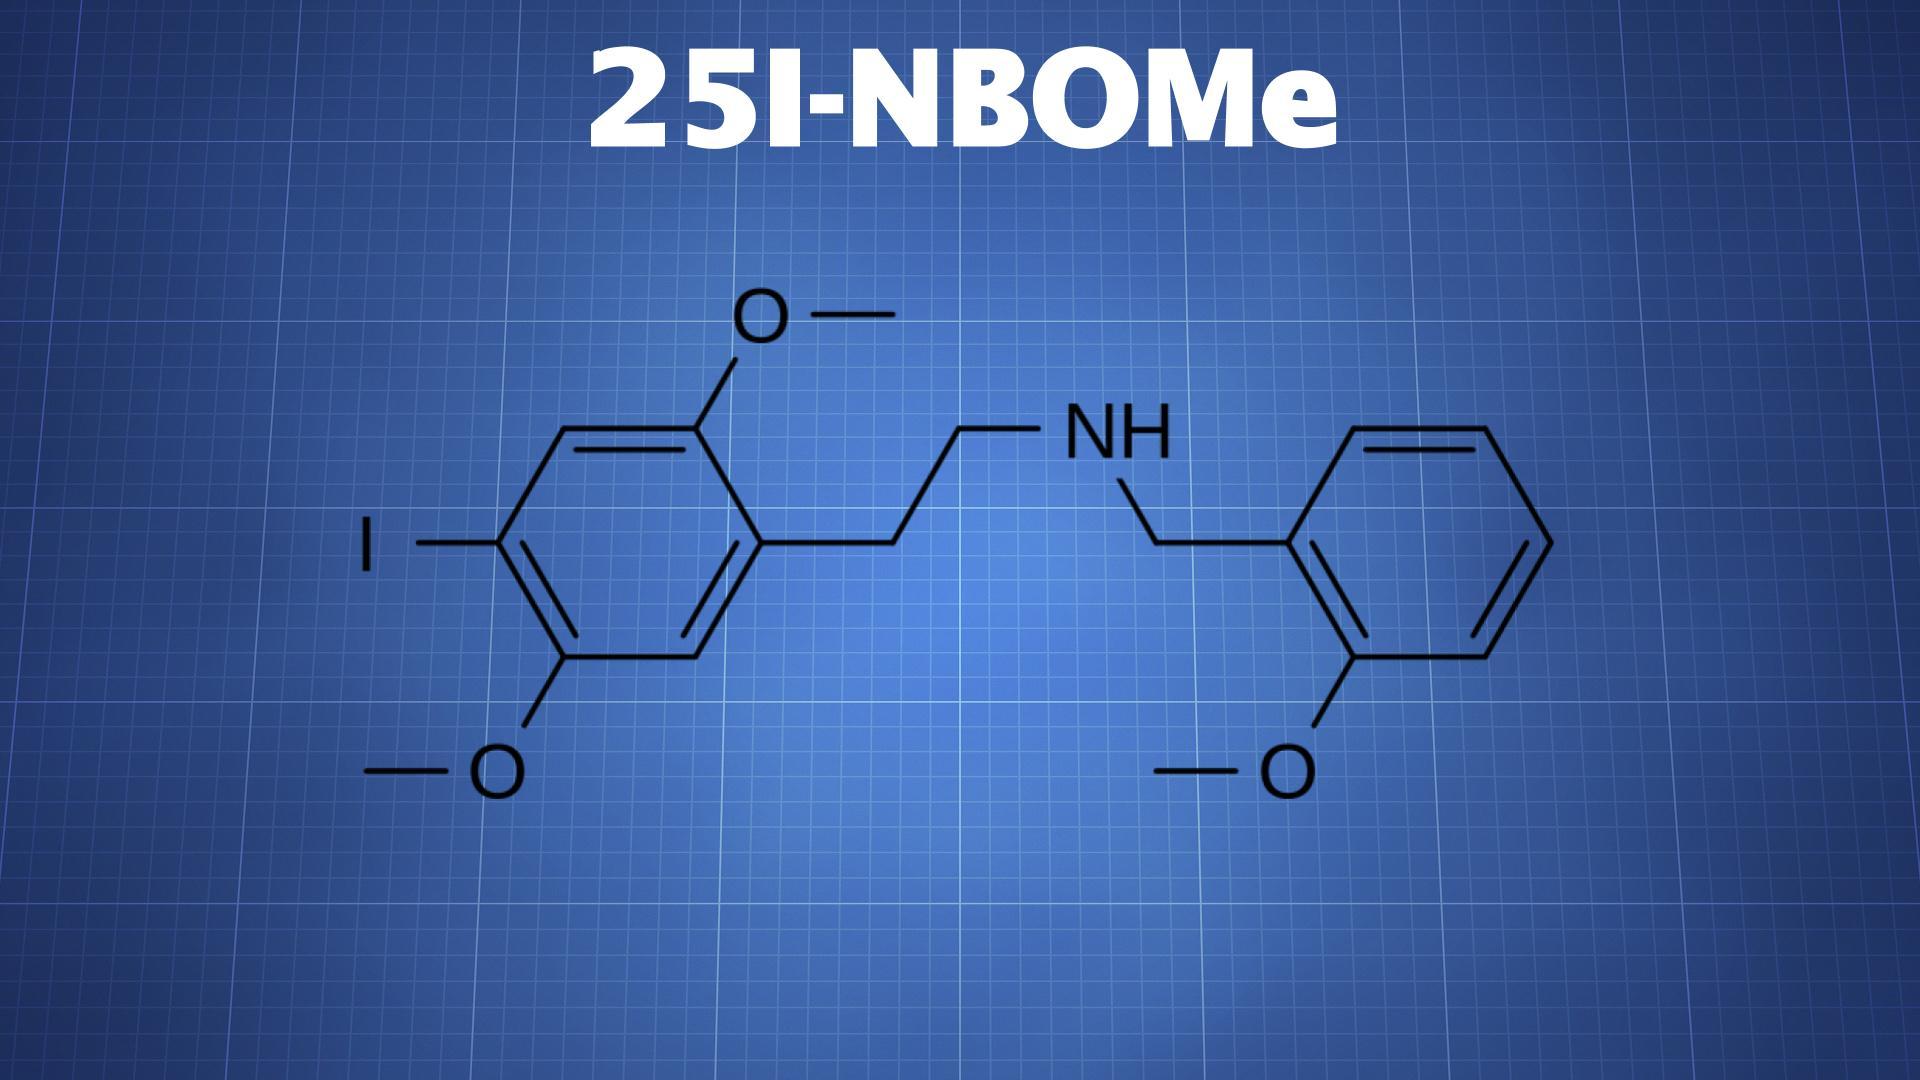 25I-NBOMe - The Drug Classroom